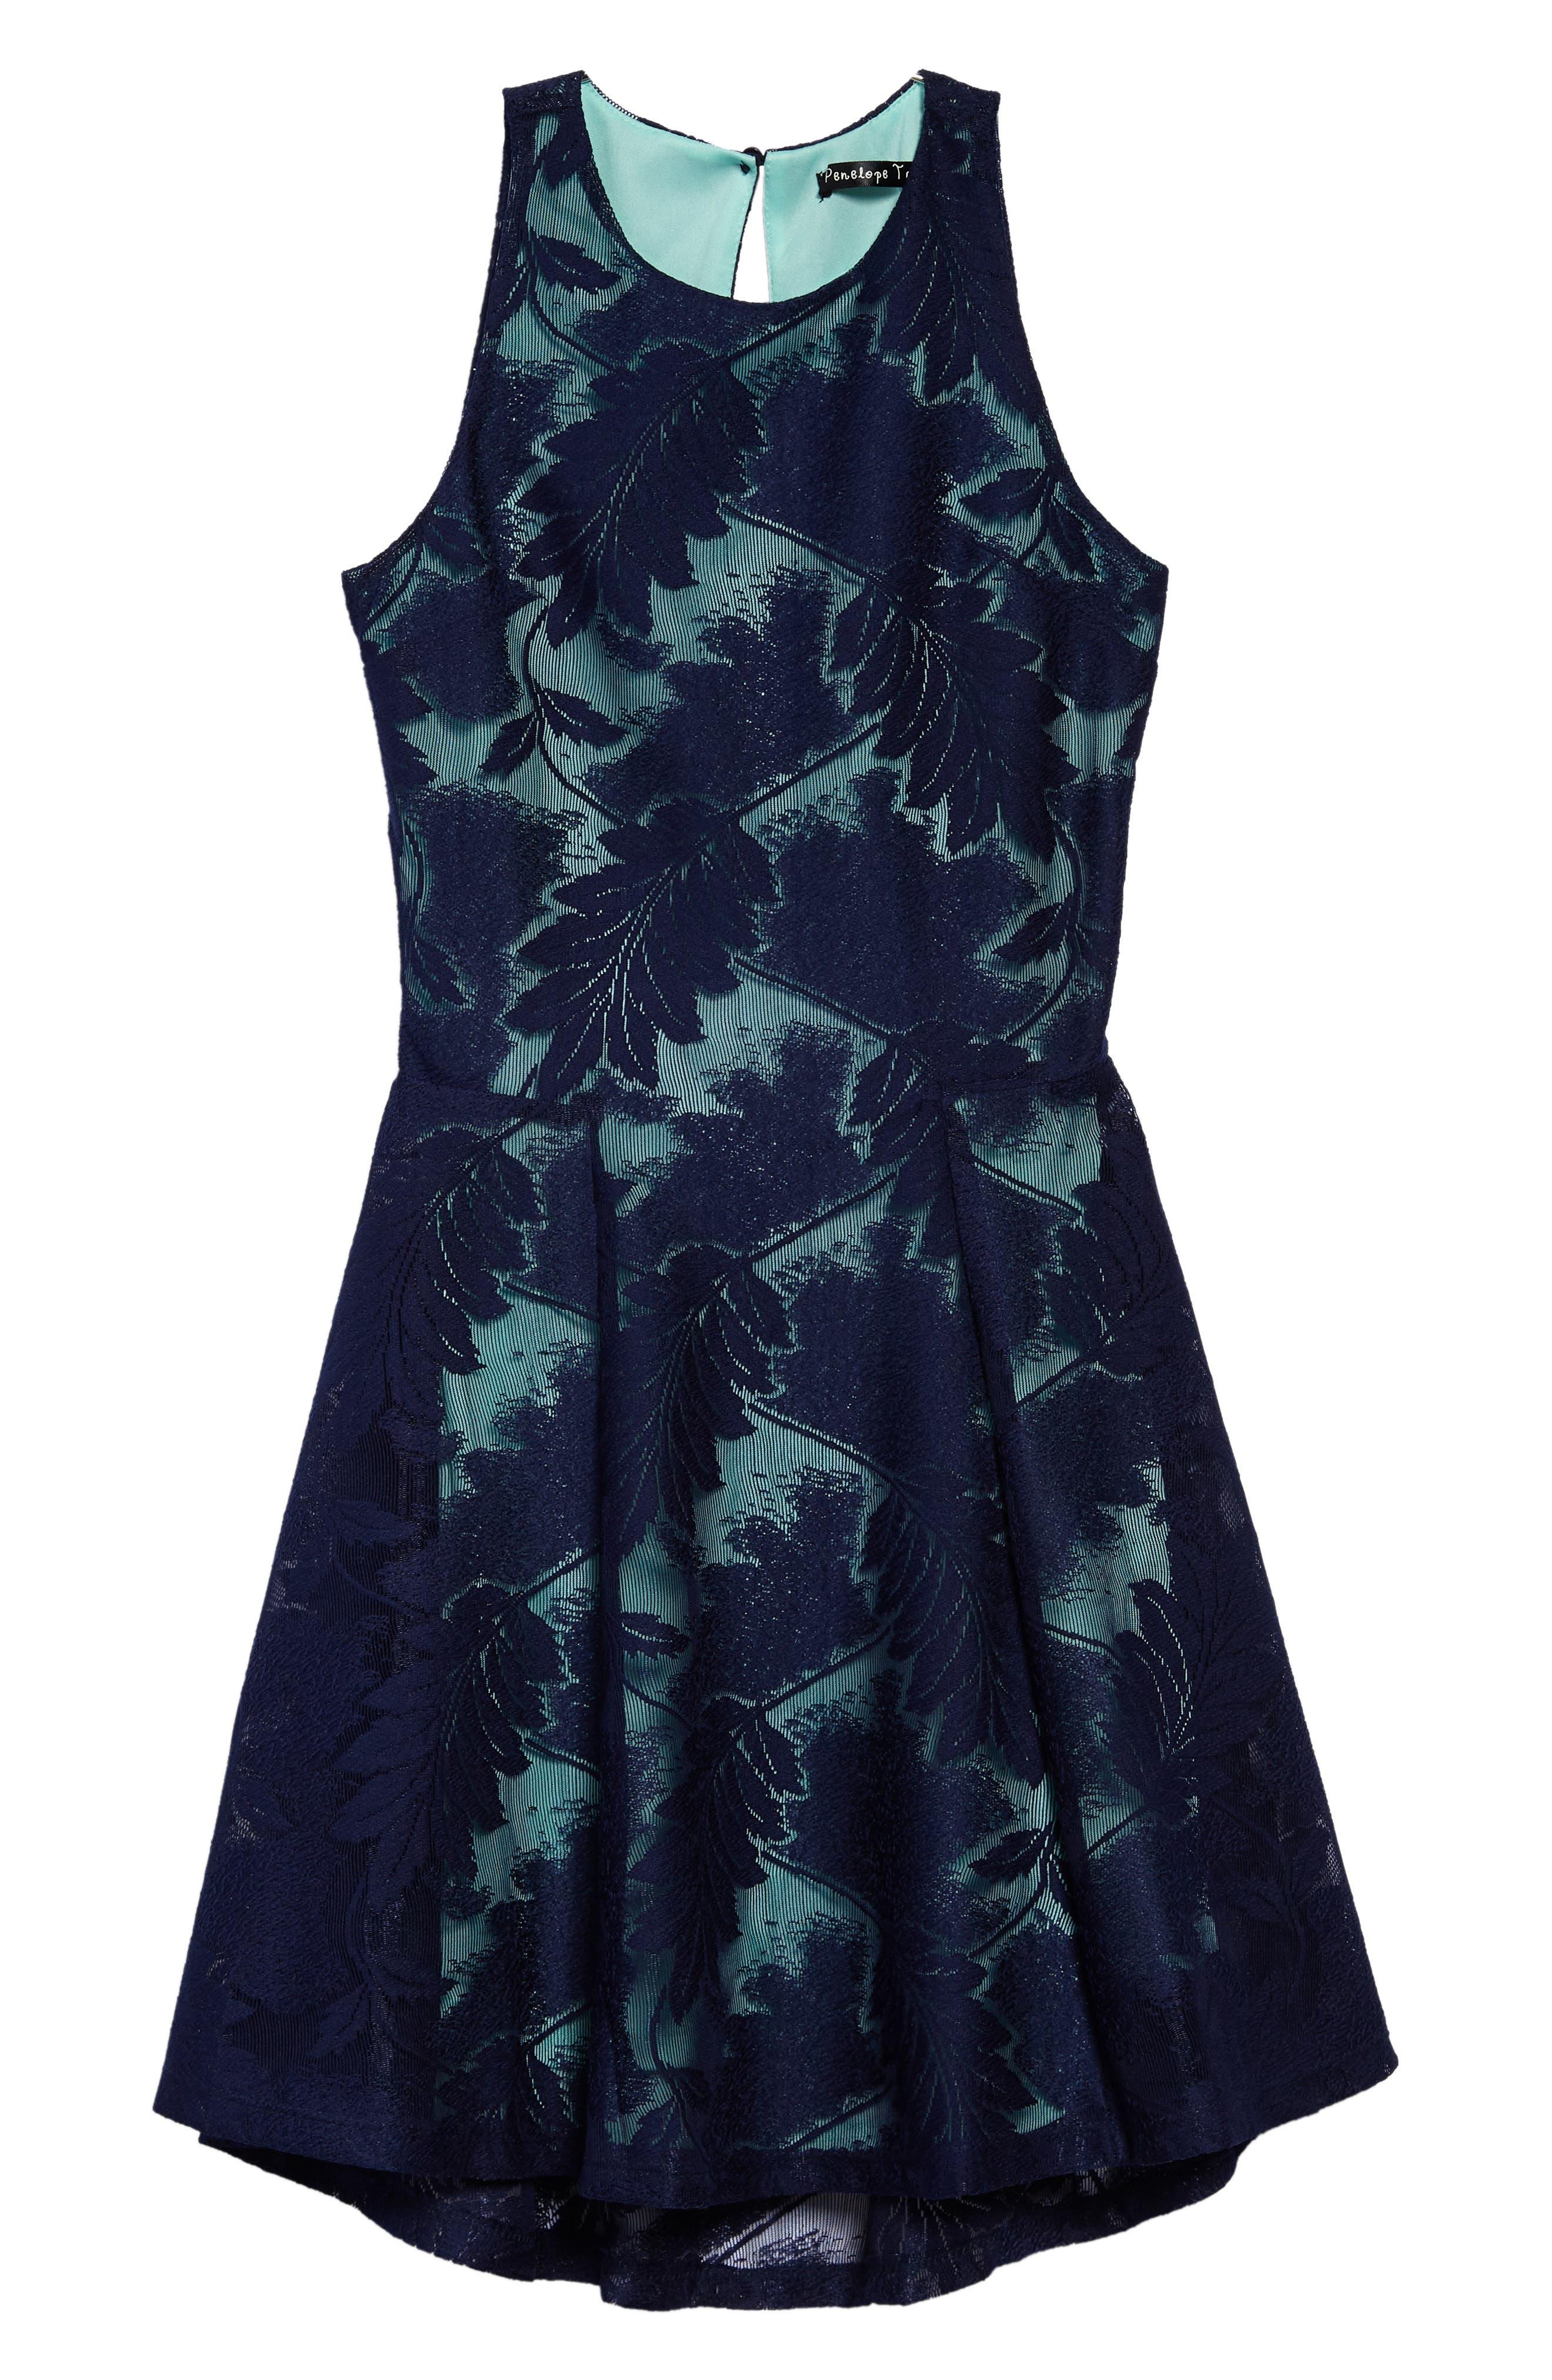 Alternate Image 1 Selected - Penelope Tree Jessica Dress (Big Girls)